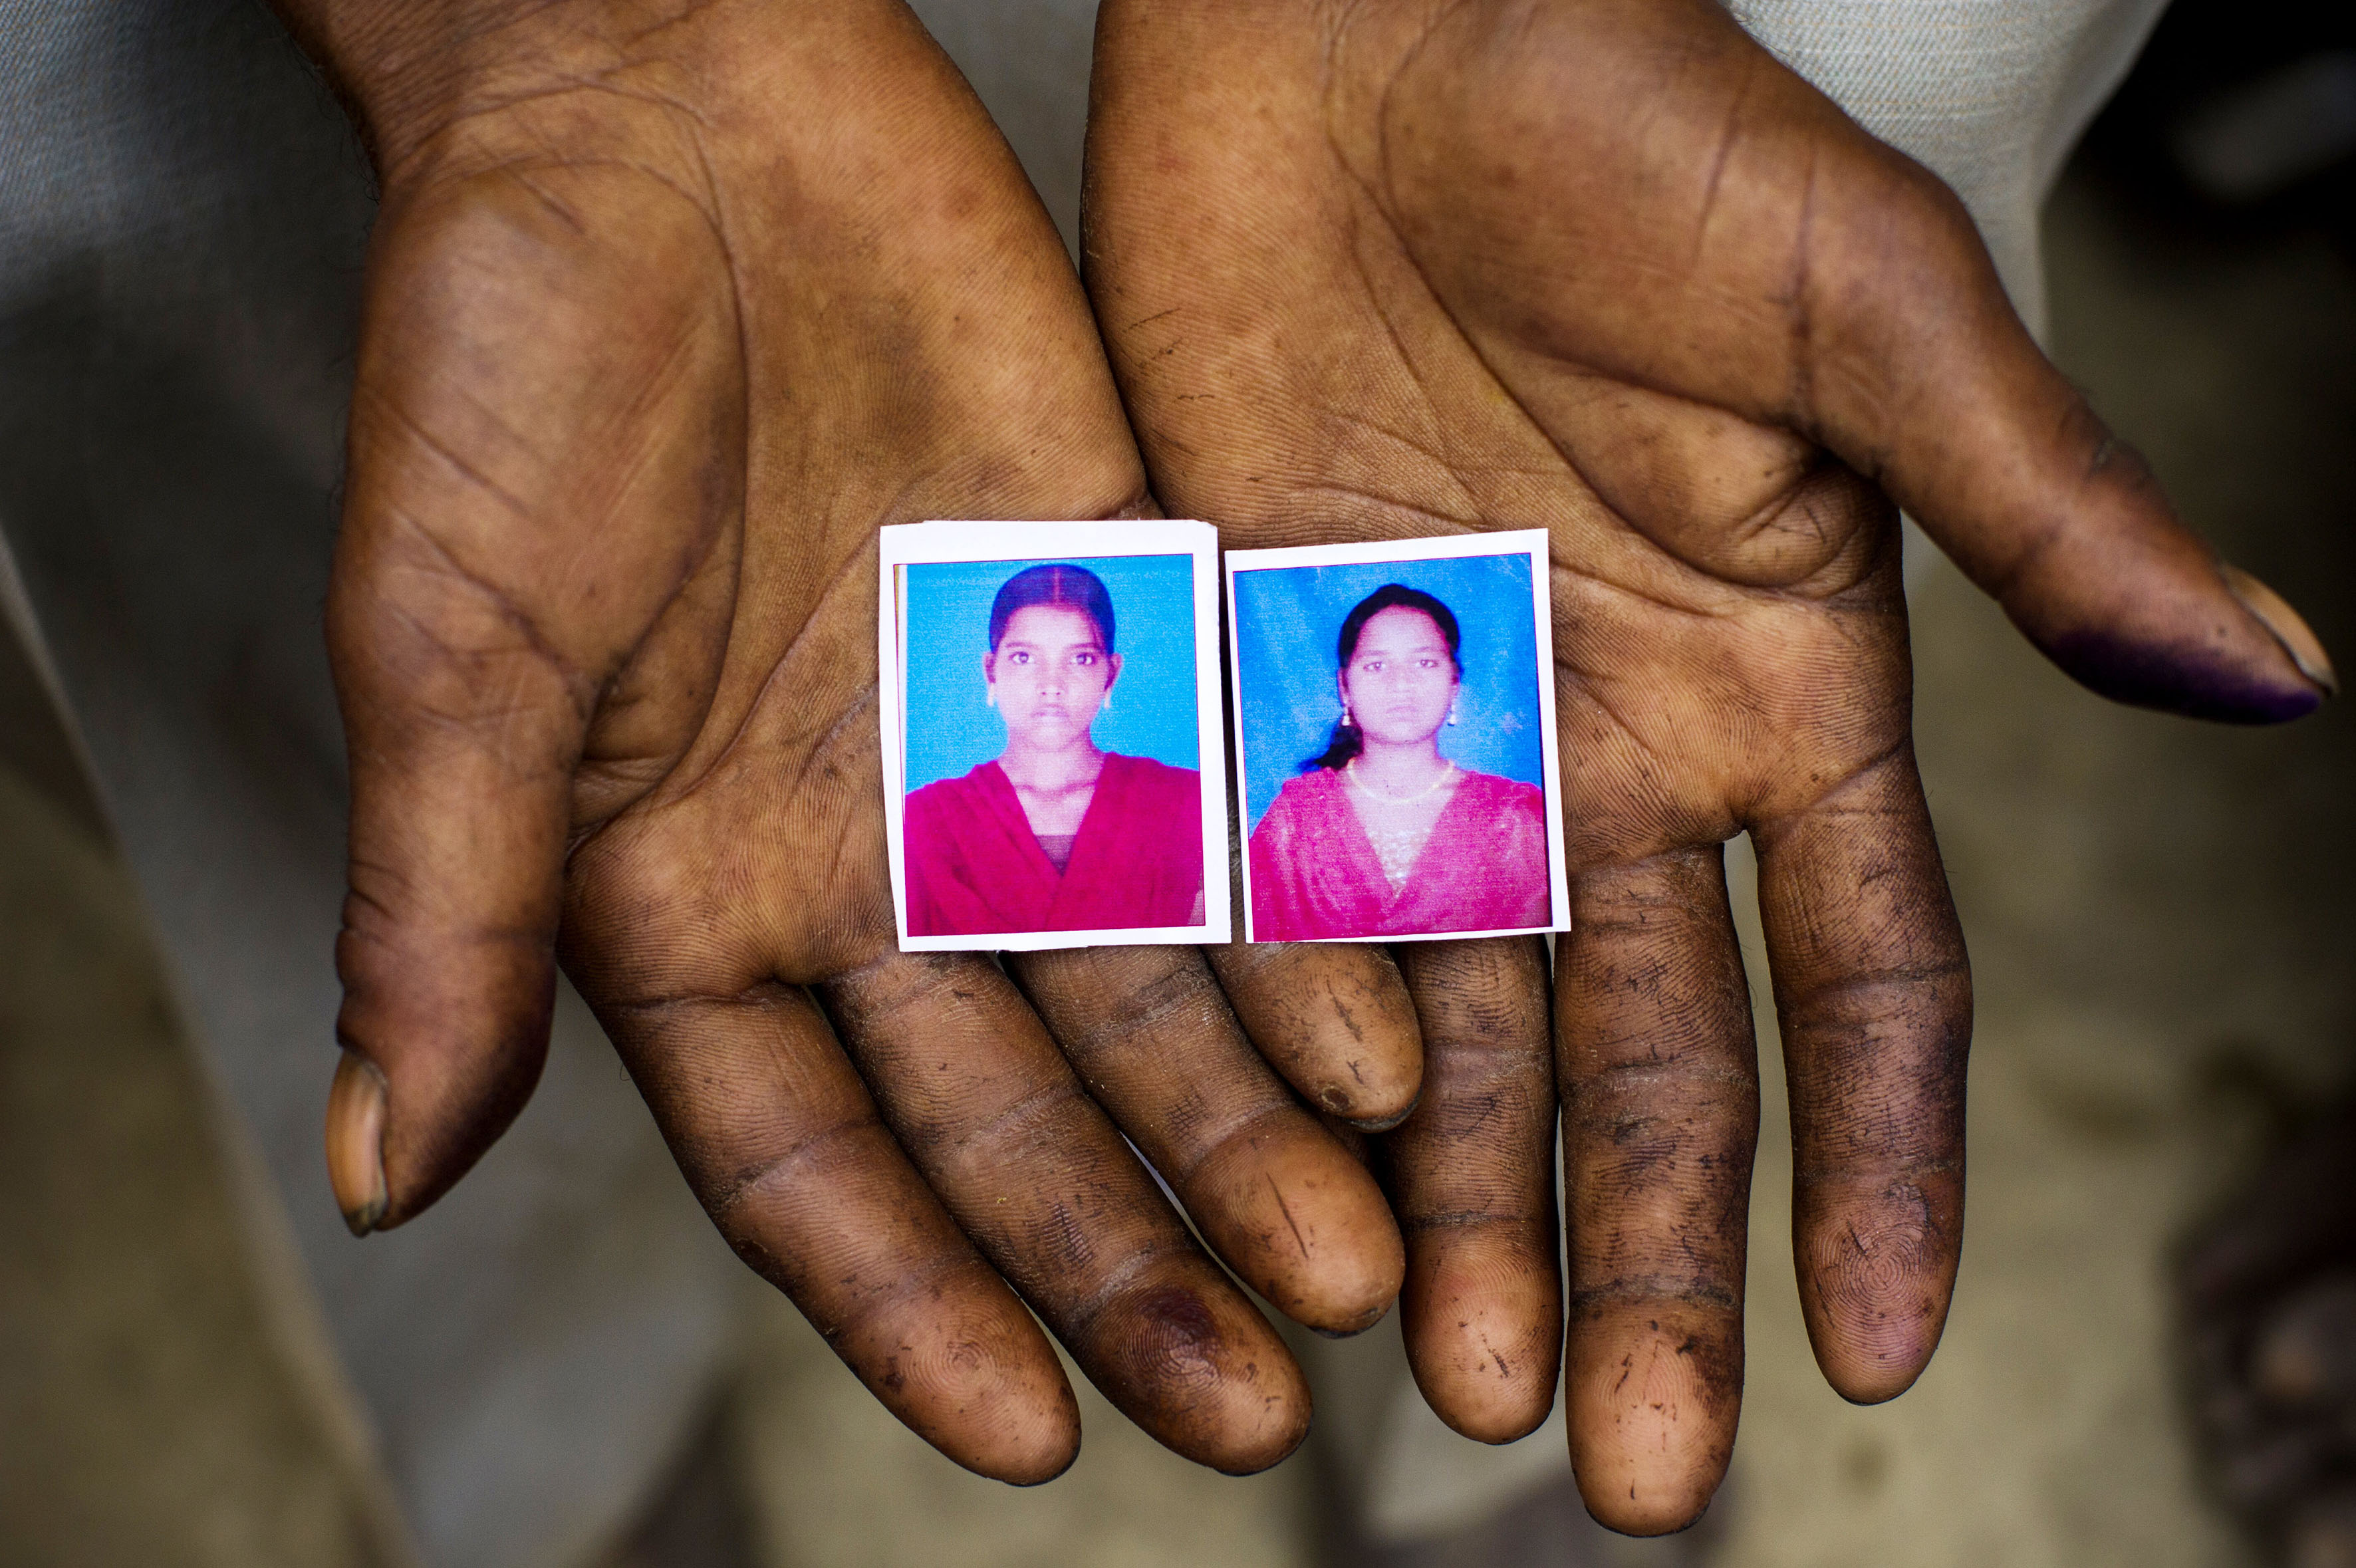 Photos India Rape And Hanging Shocks Village Time Com